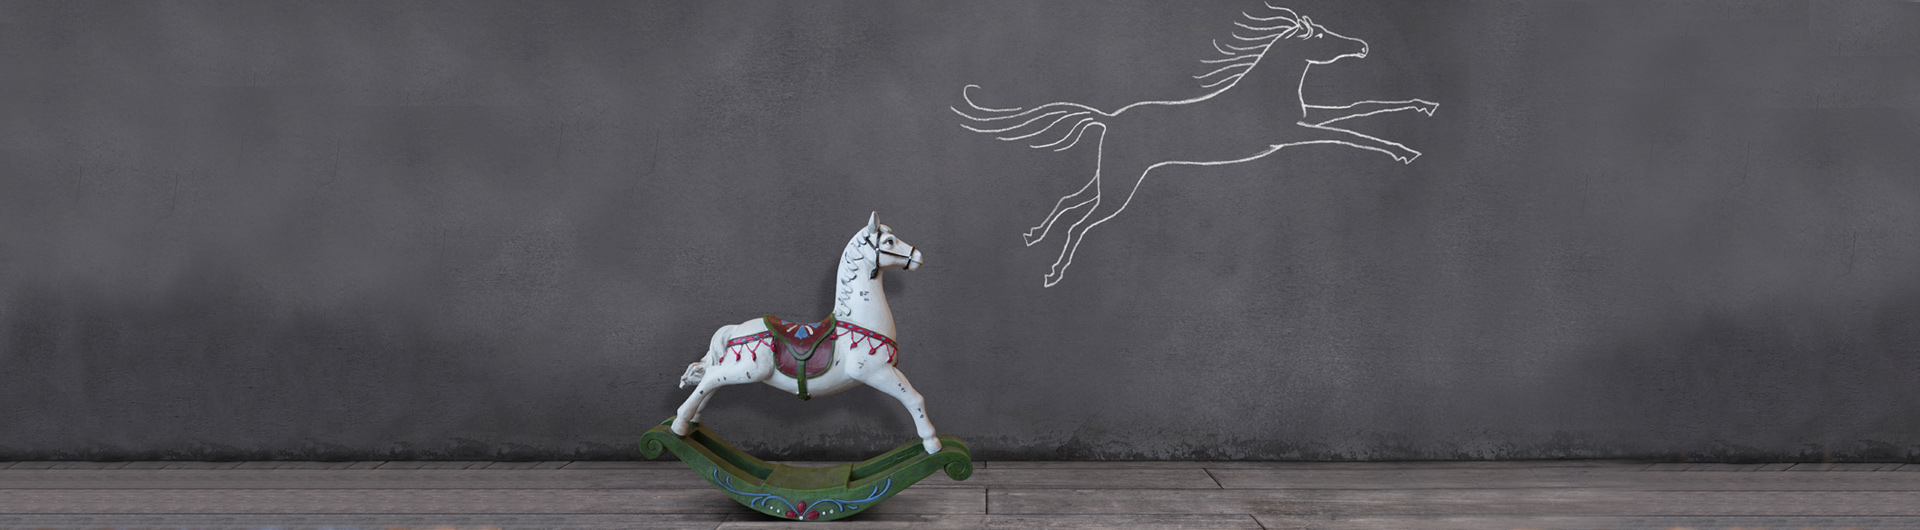 rocking-horse-slider